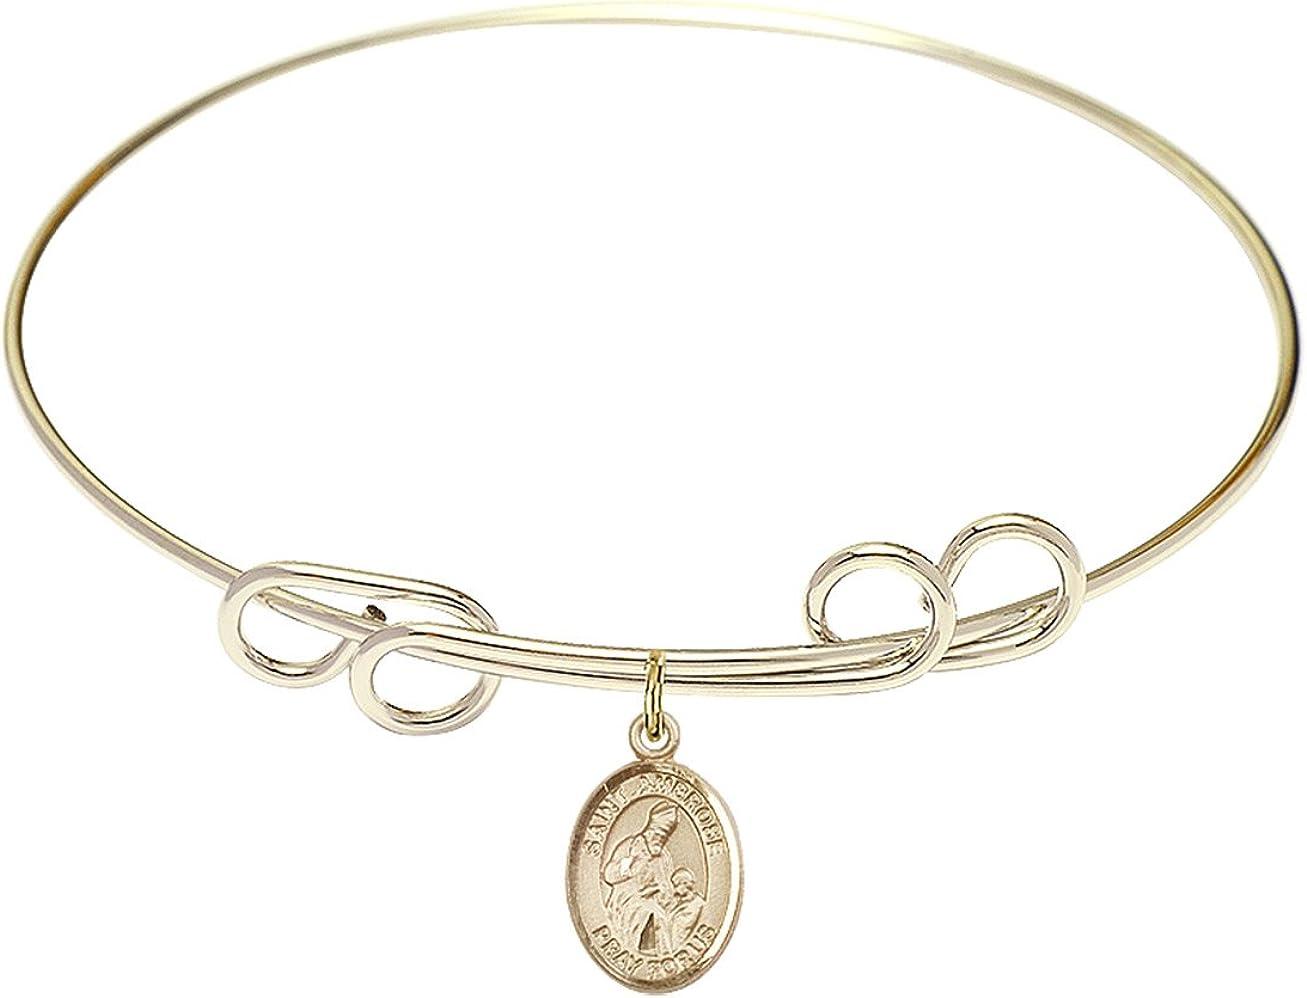 Special sale item DiamondJewelryNY Double Loop Bangle Max 43% OFF Bracelet Ambrose St. with a